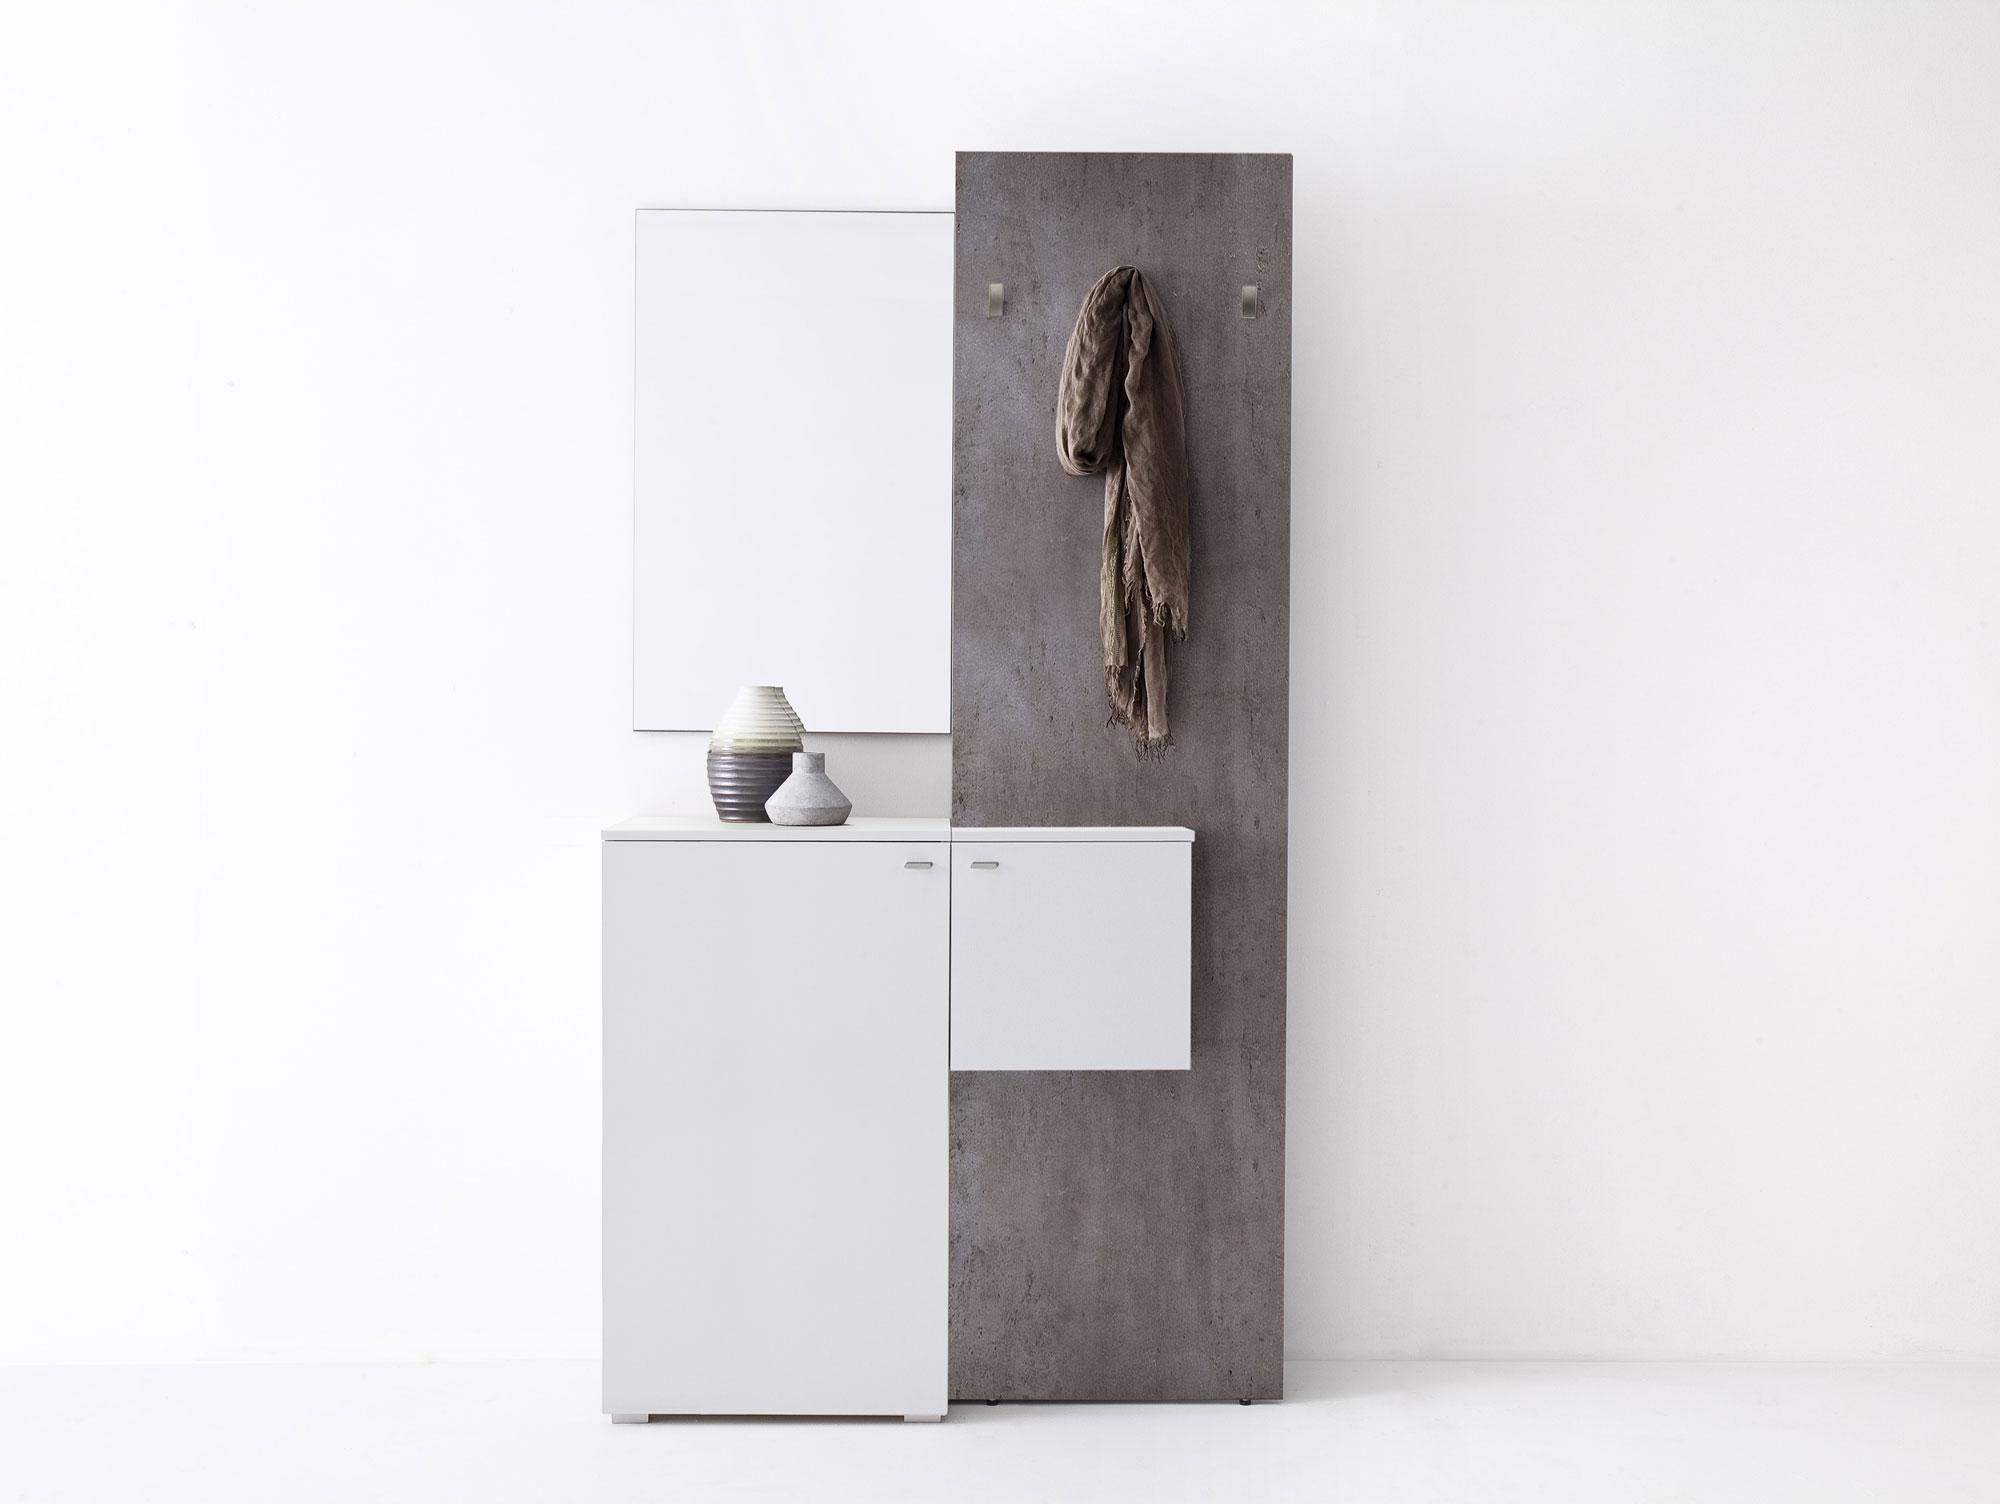 zarah komplett garderobe weiss beton. Black Bedroom Furniture Sets. Home Design Ideas